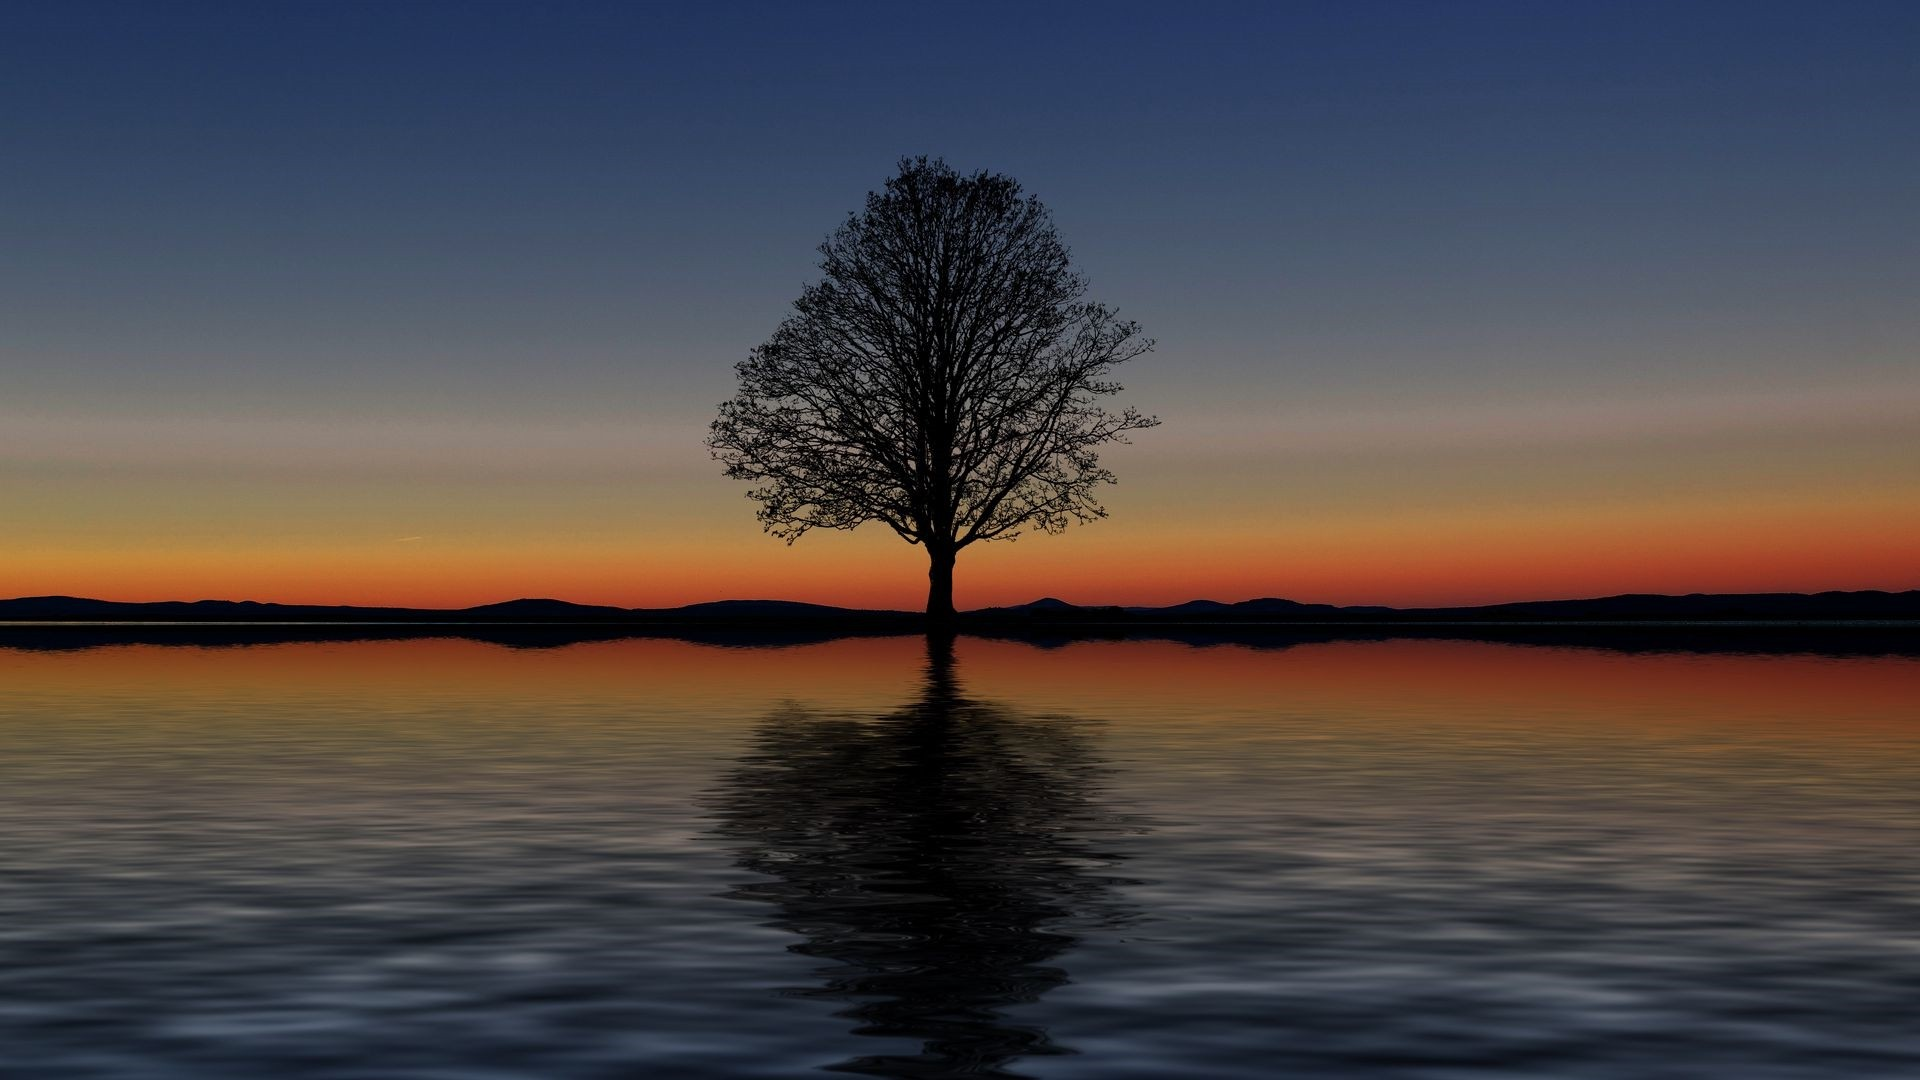 Lonely Trees Minimalist Wallpaper theme